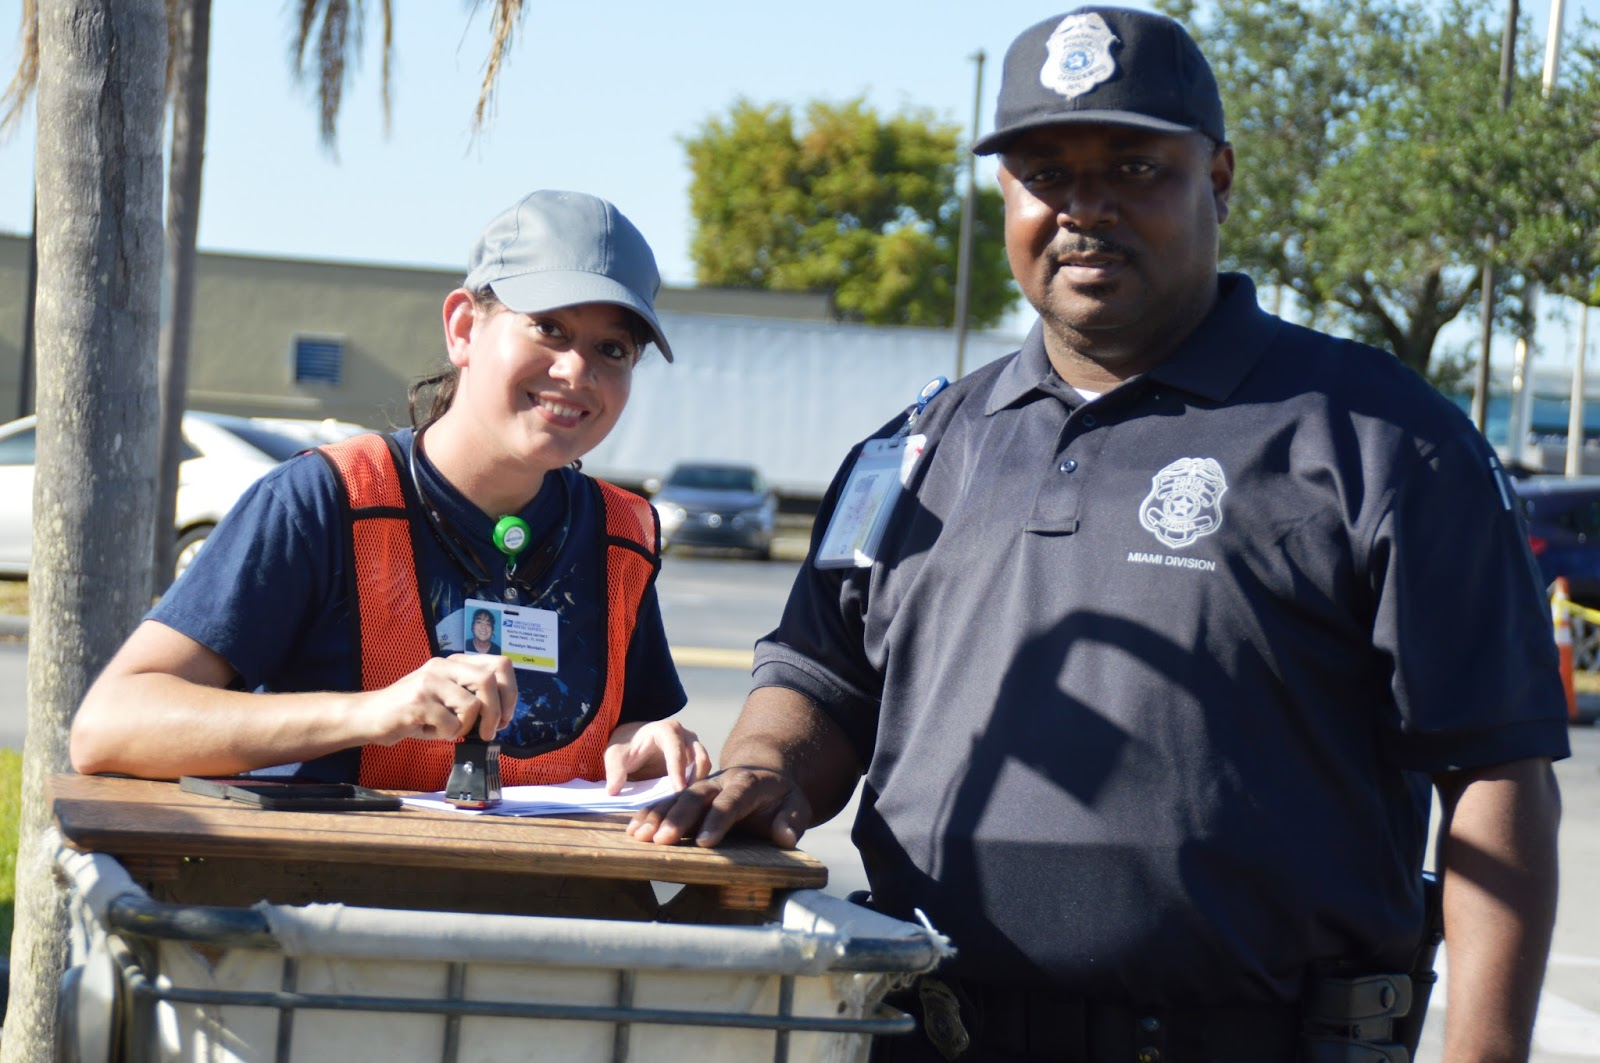 South Florida Postal Blog: Miami Employees Provide Tax Relief